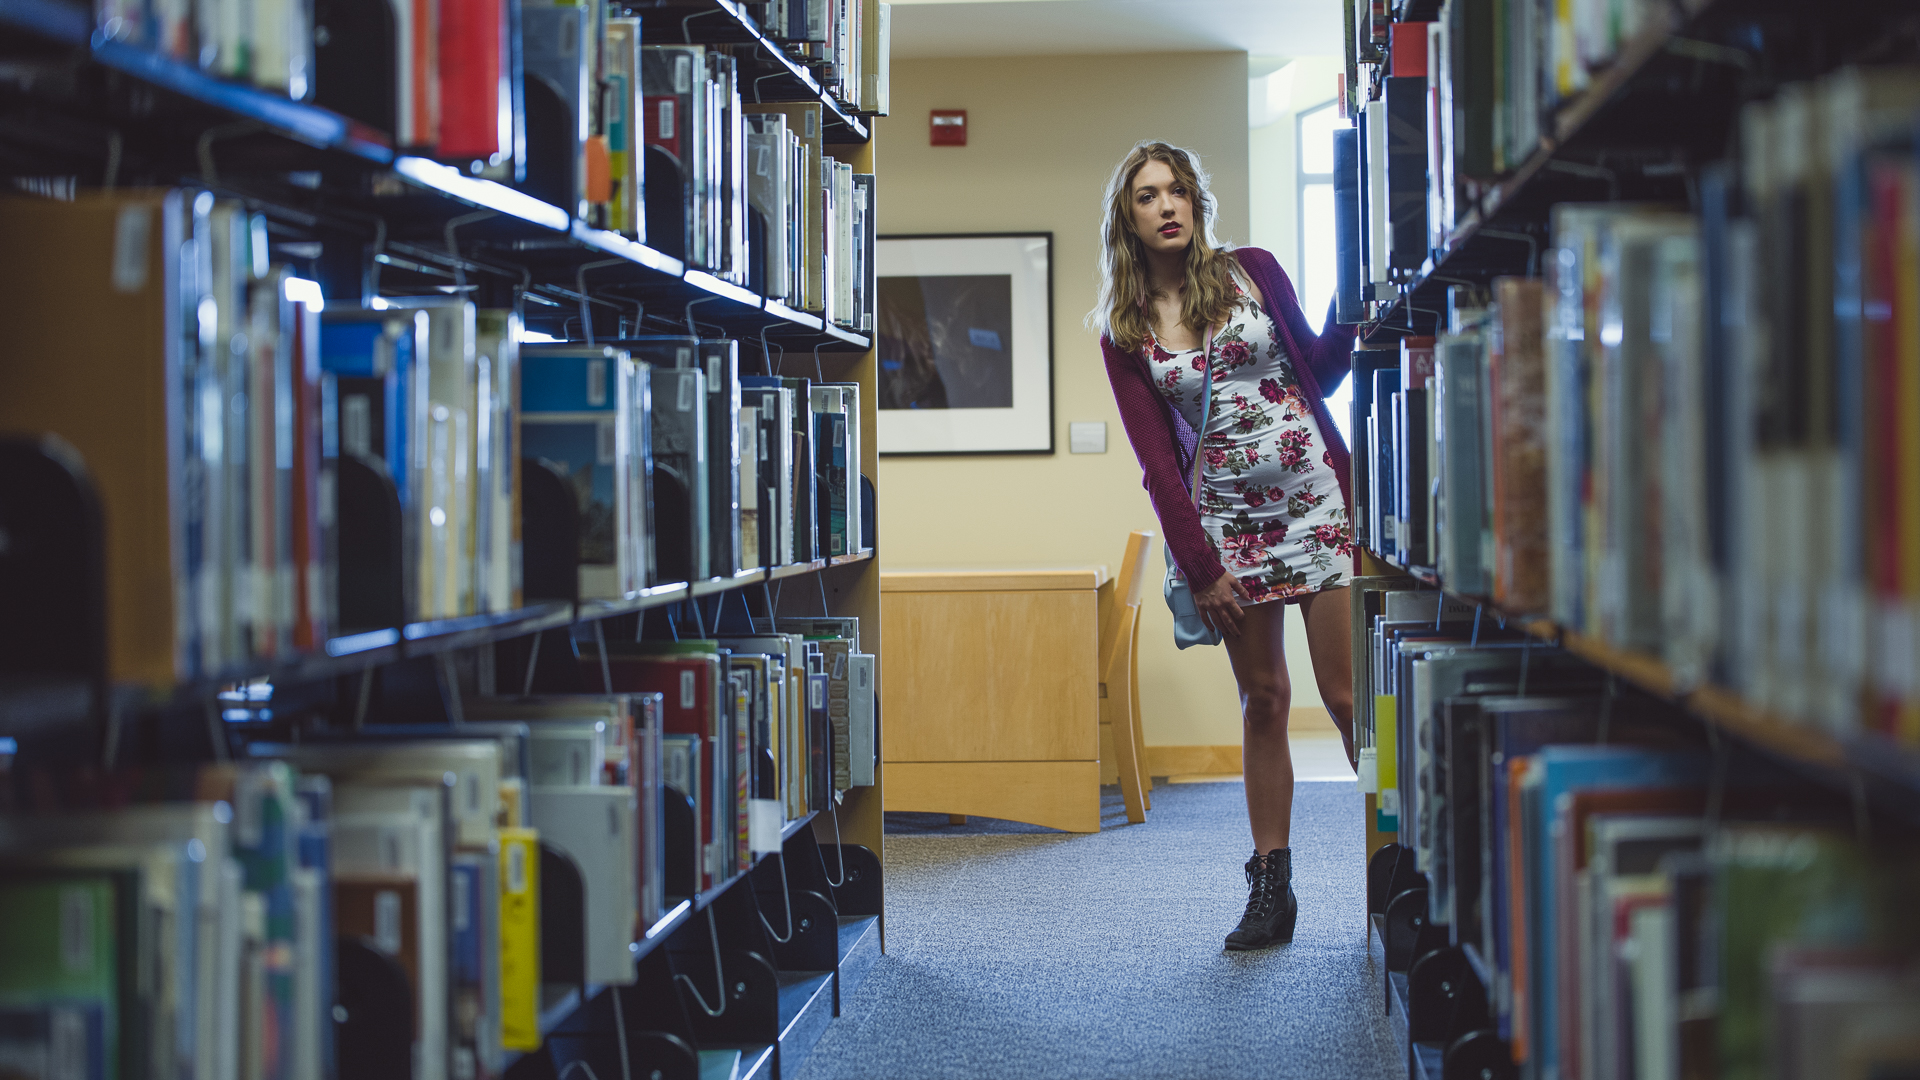 Nicole_Rose_Library-2.jpg